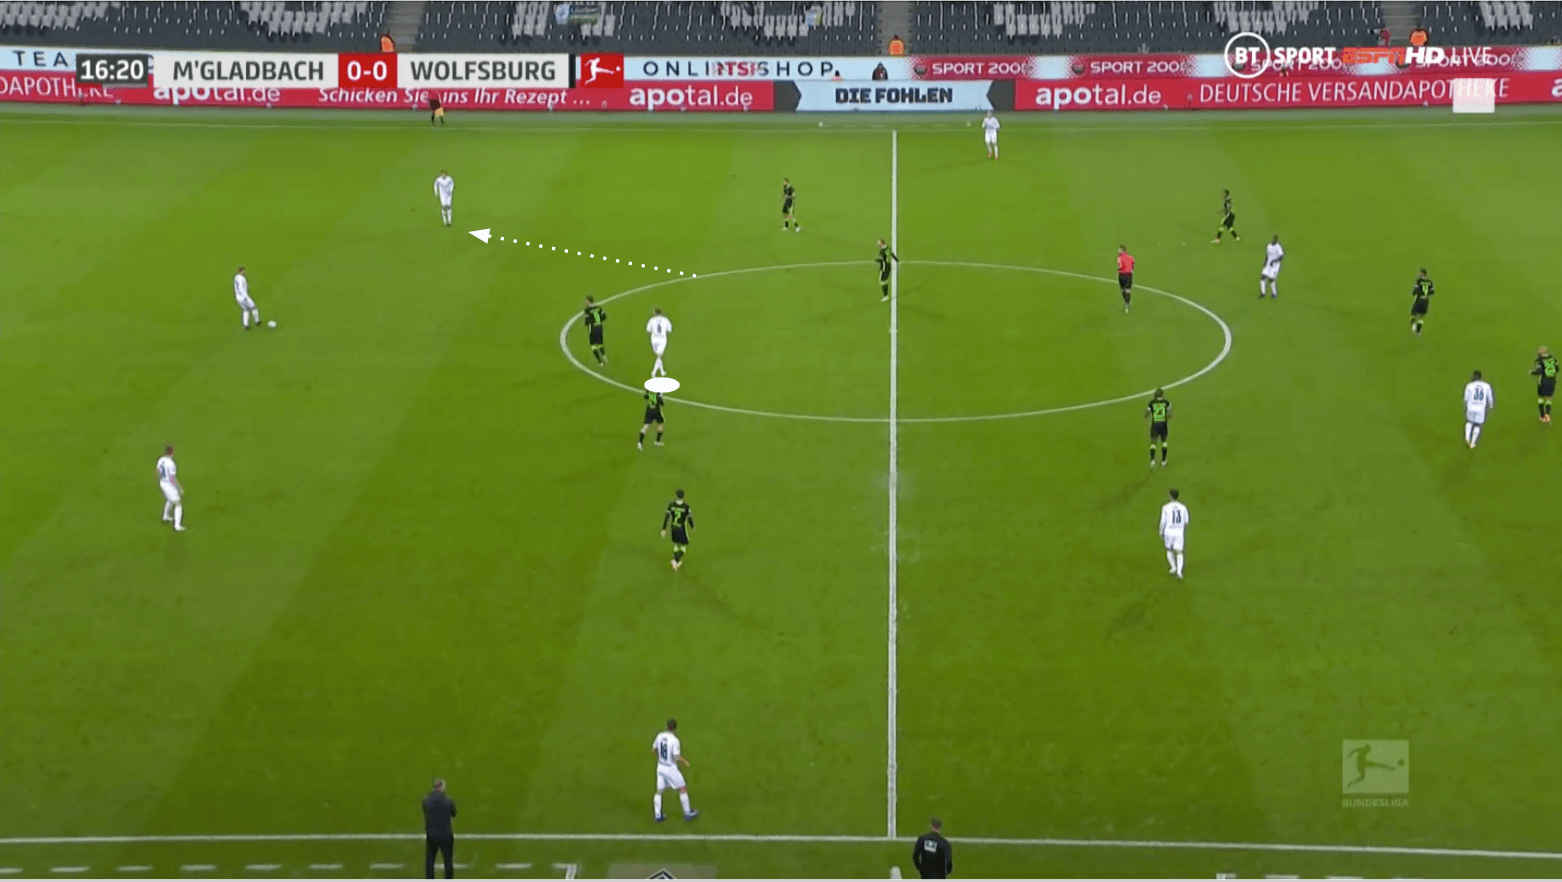 Bundesliga 2020/21: Borussia Mönchengladbach vs VfL Wolfsburg - tactical analysis tactics